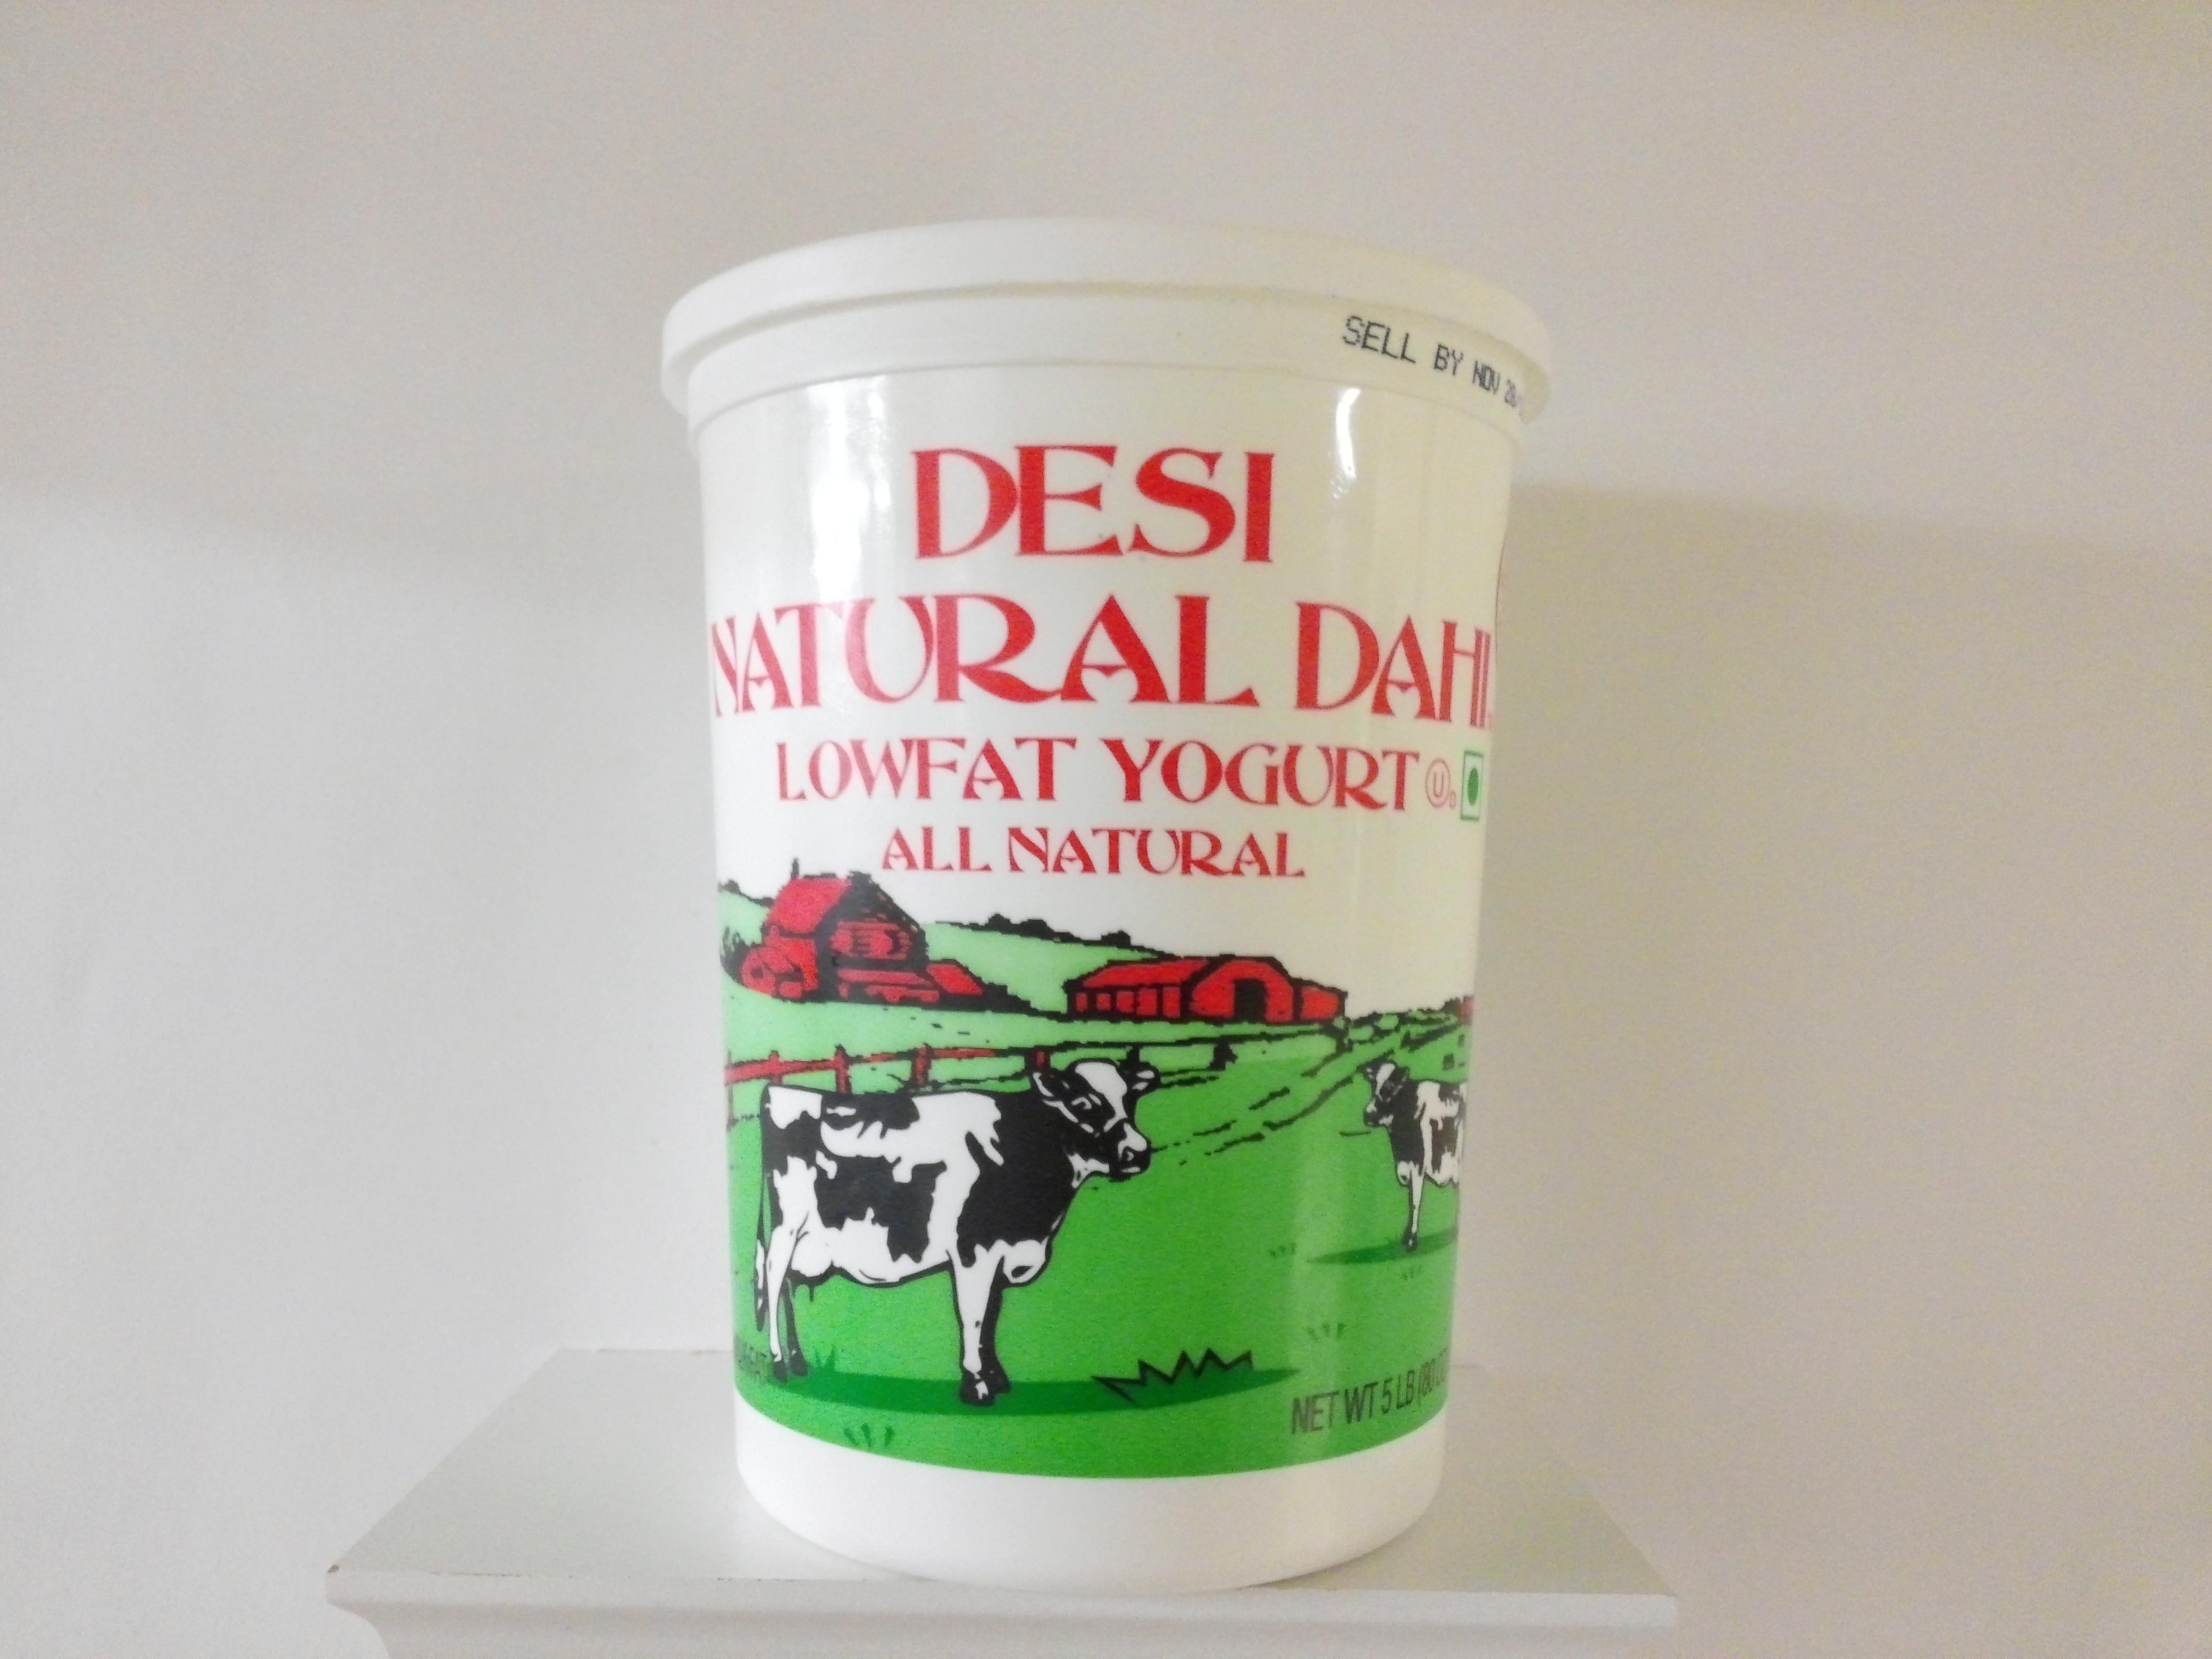 Desi Low Fat Yogurt 2 lbs